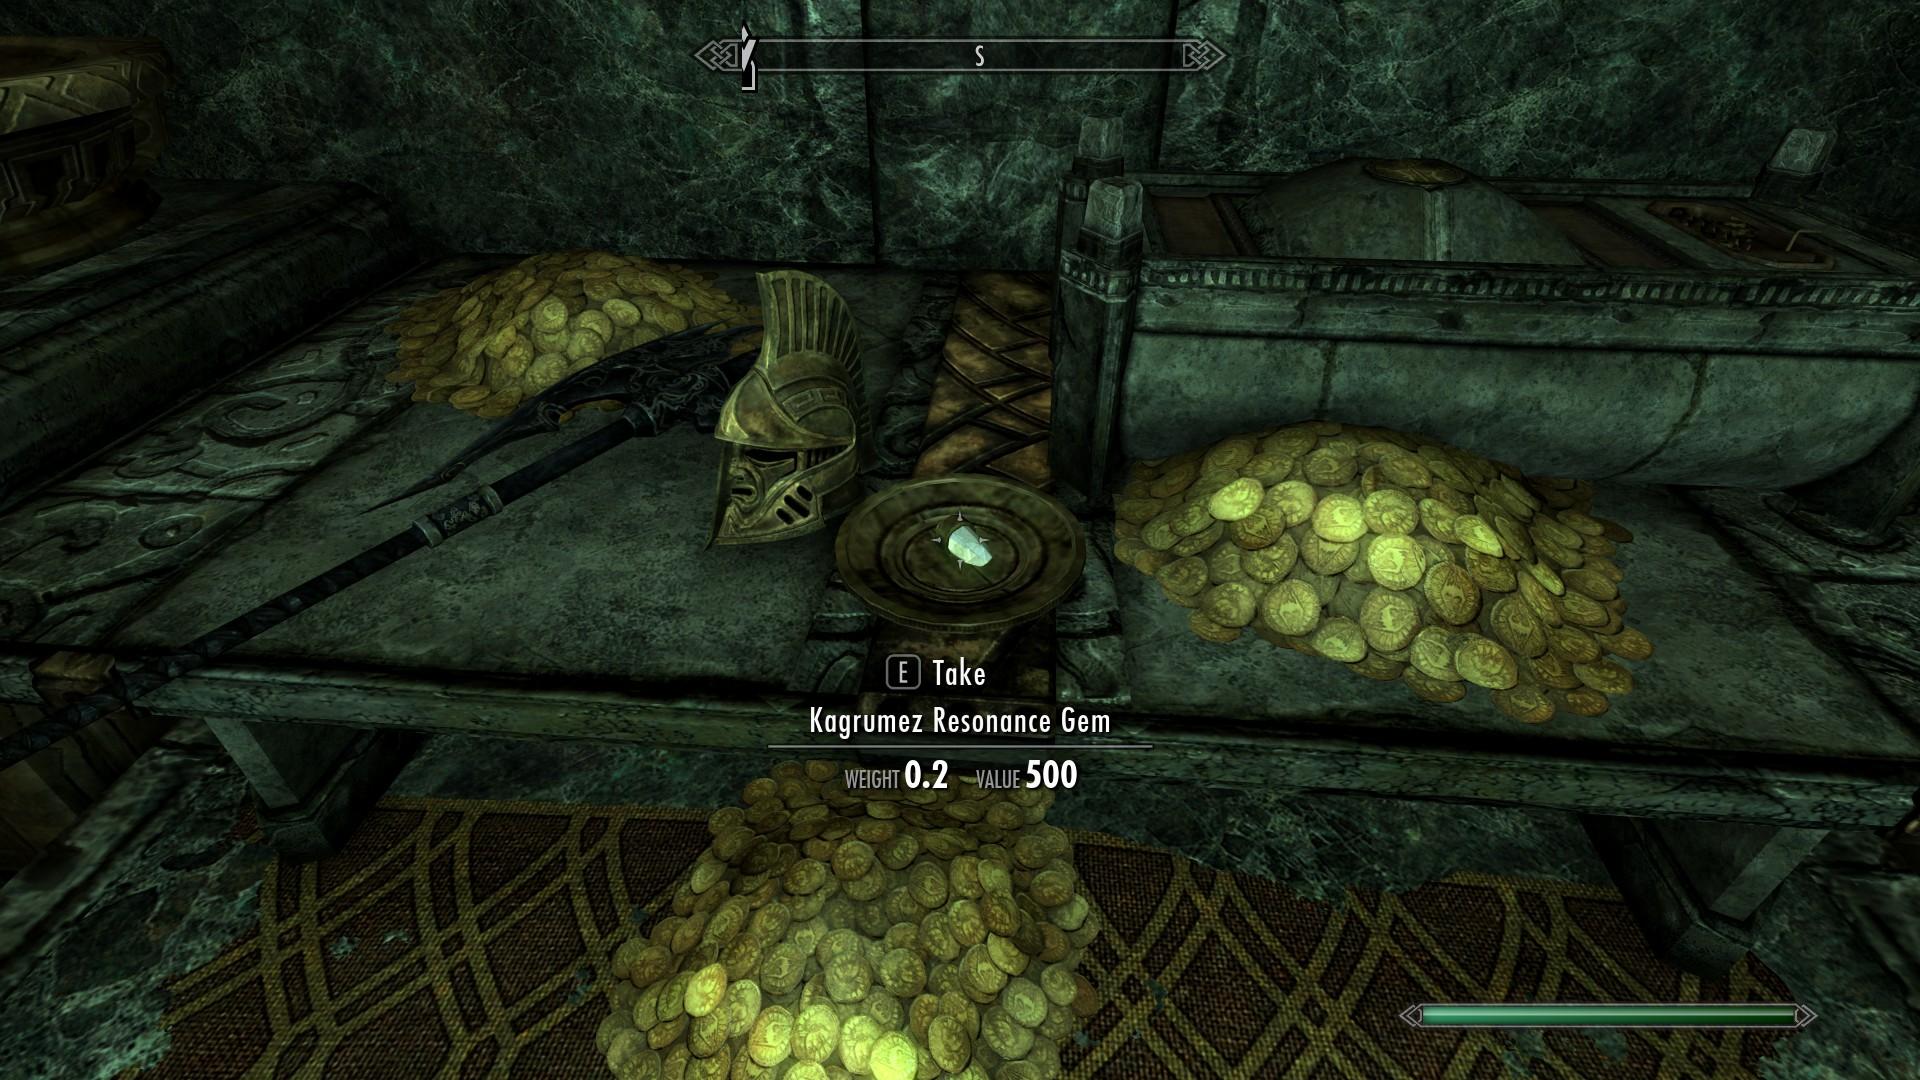 The Elder Scrolls V: Skyrim - Resonance Gem Locations